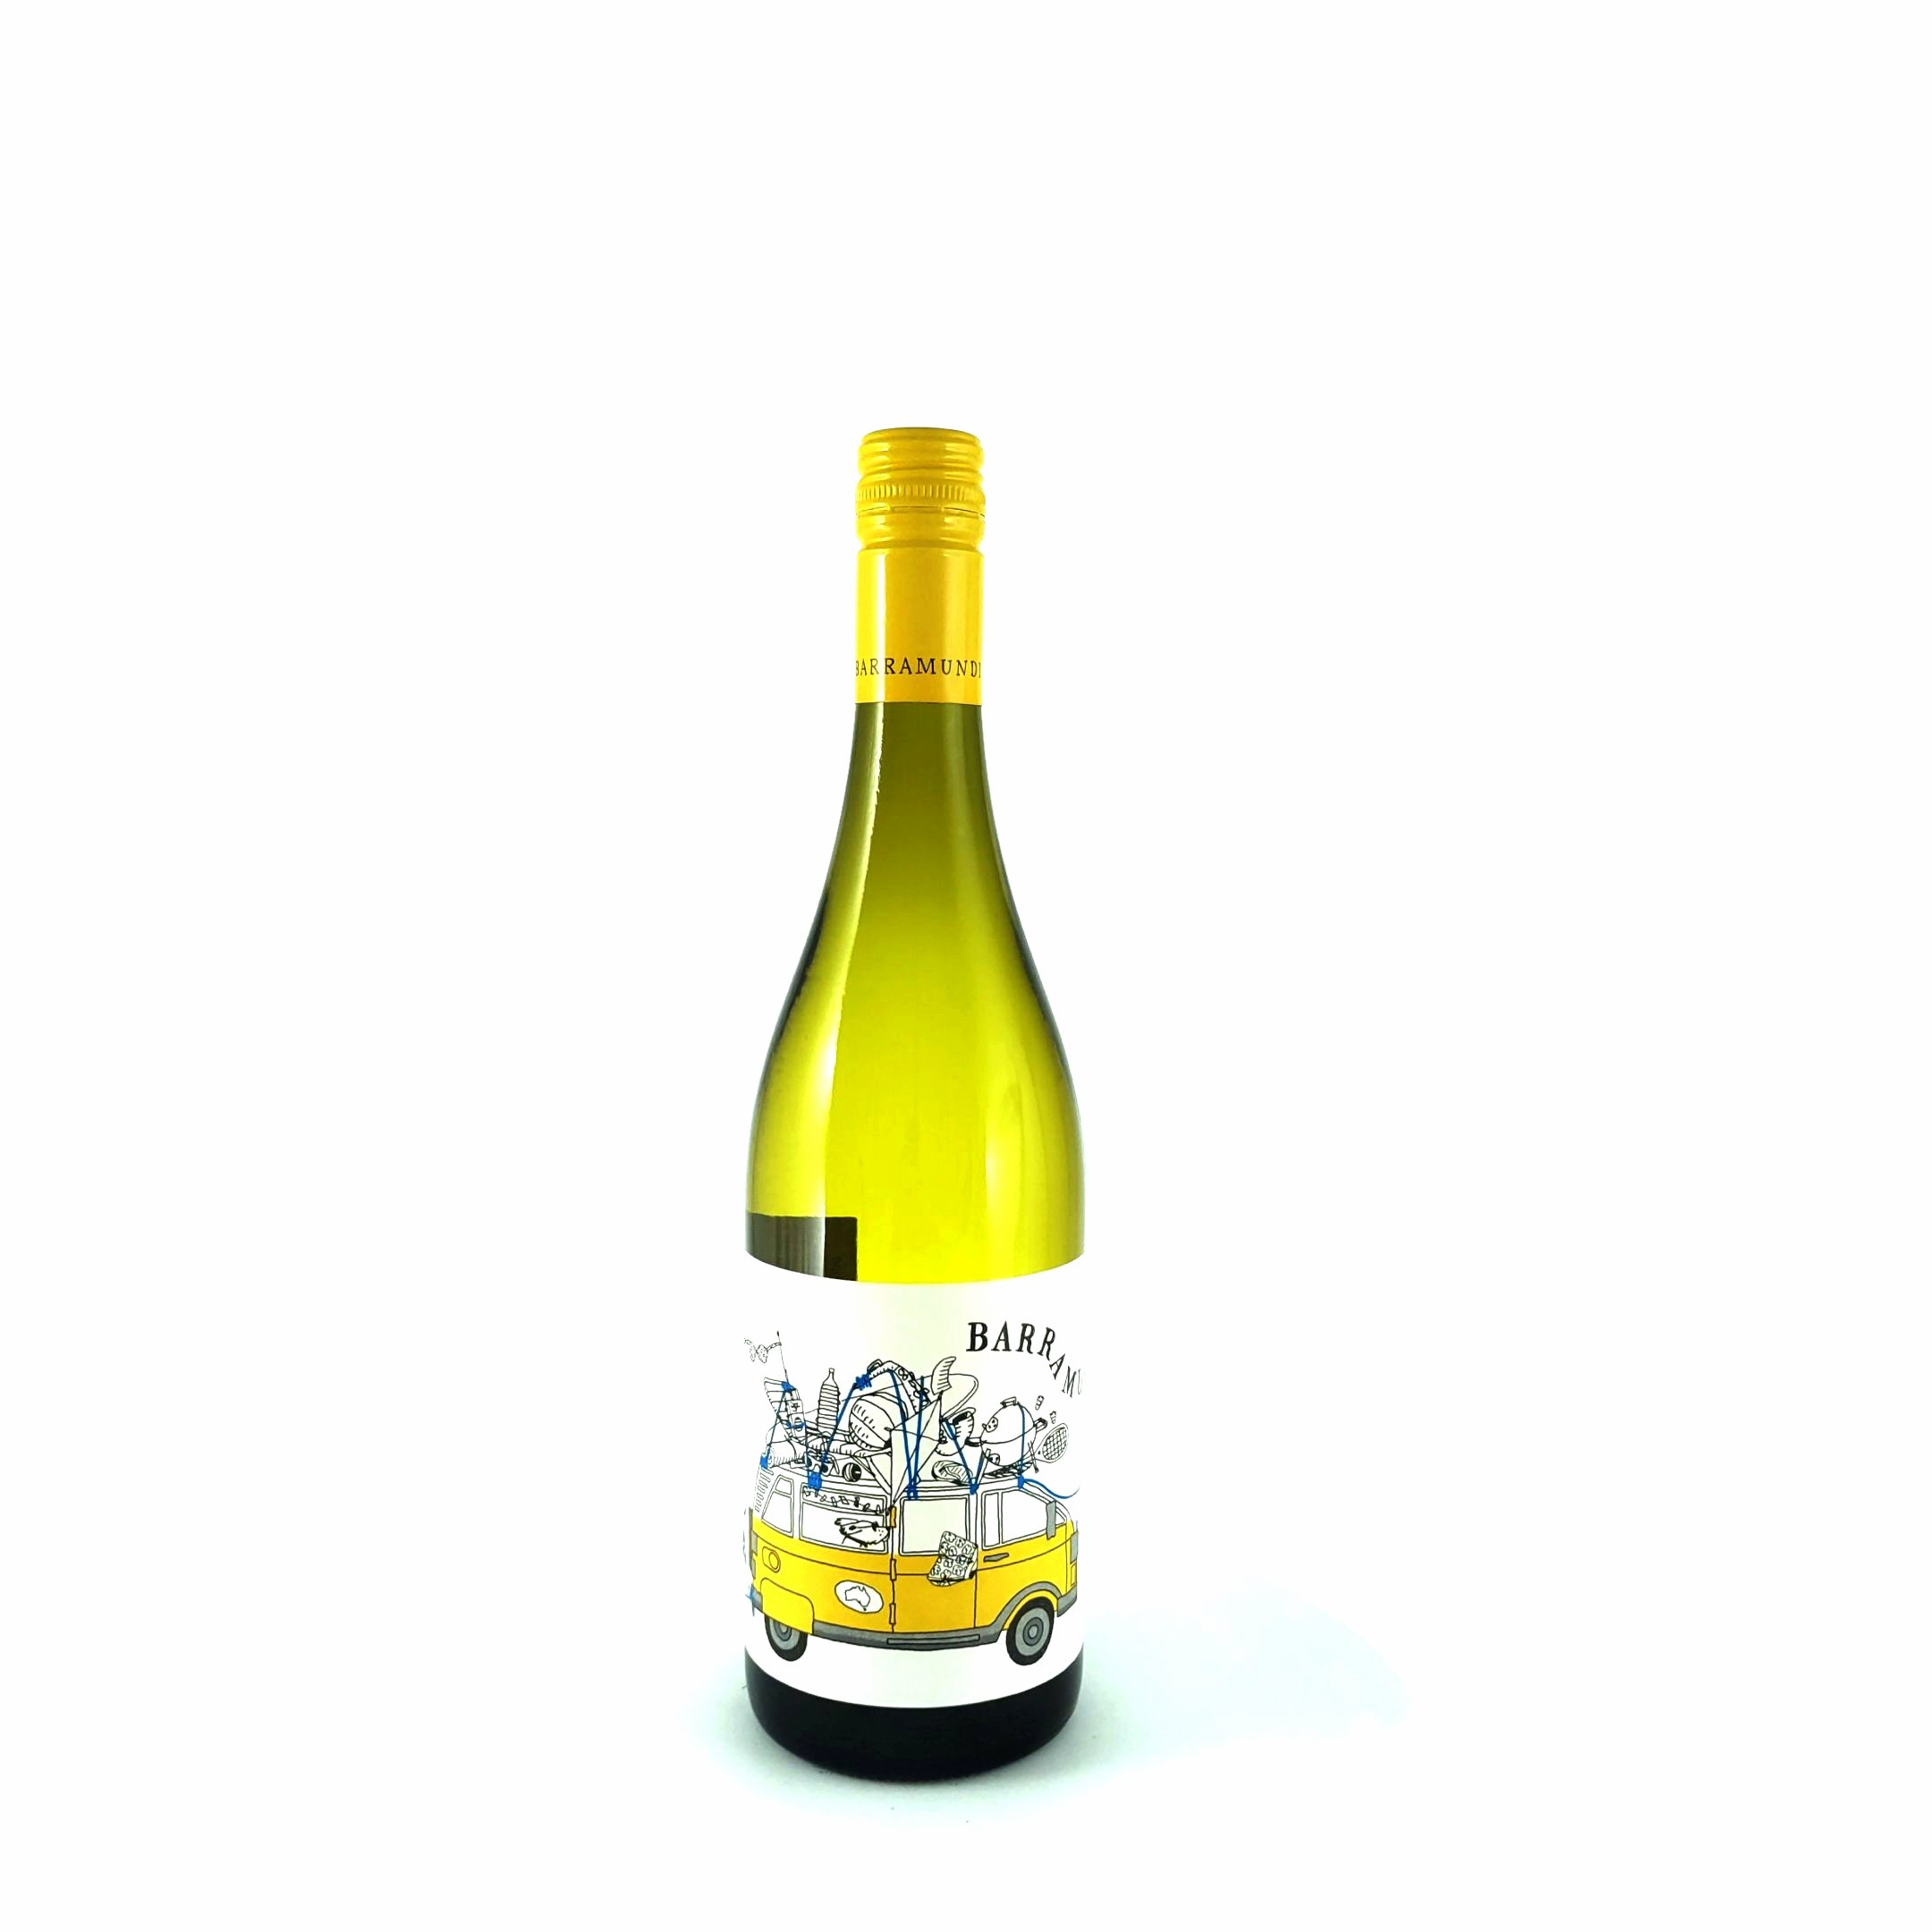 Barramundi – Chardonnay 2019